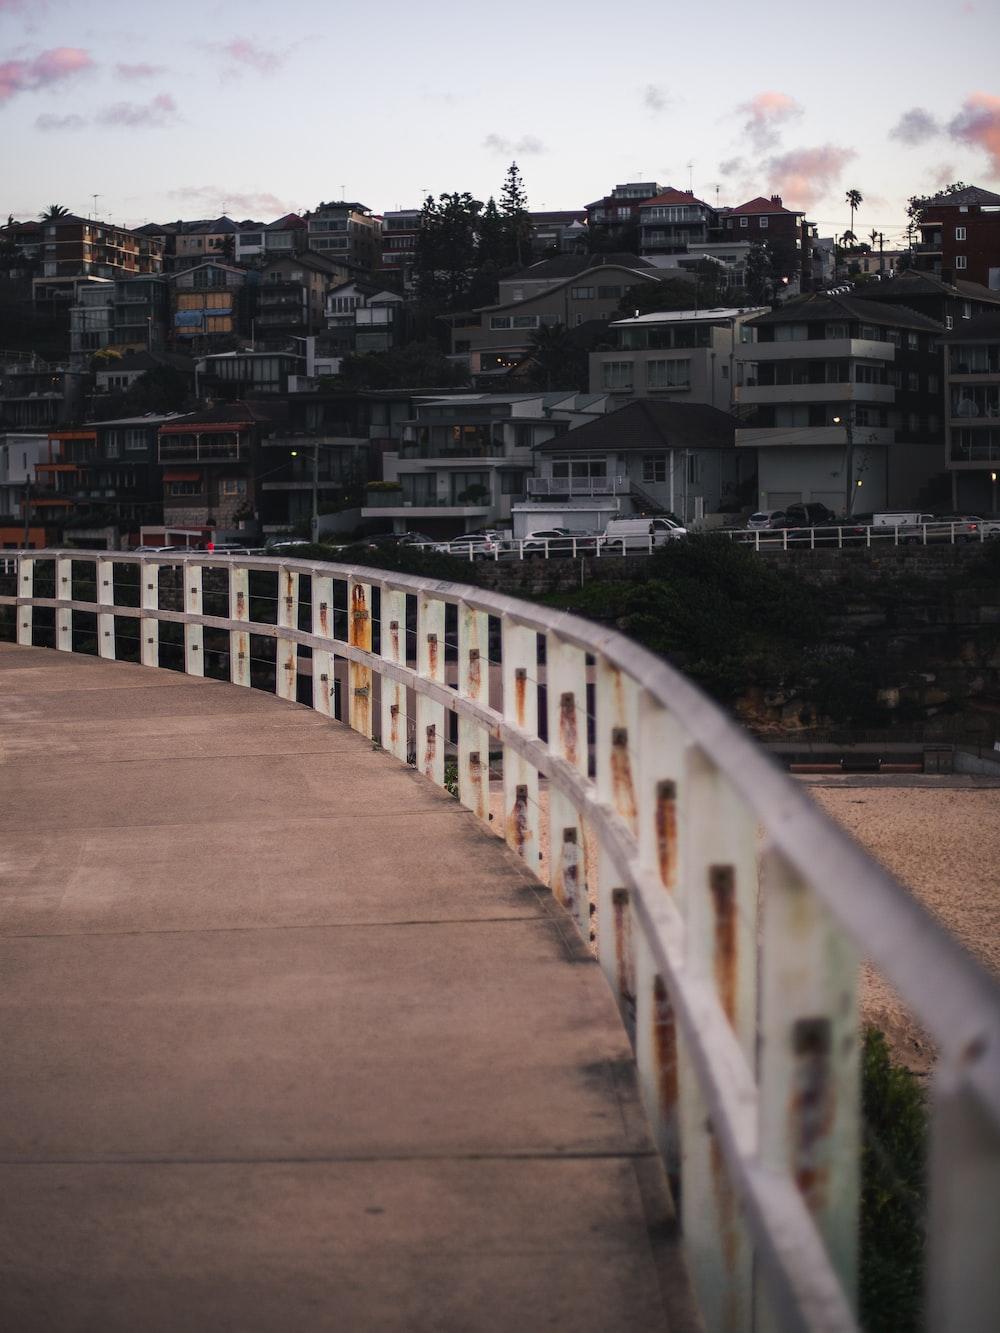 white wooden bridge over city during daytime